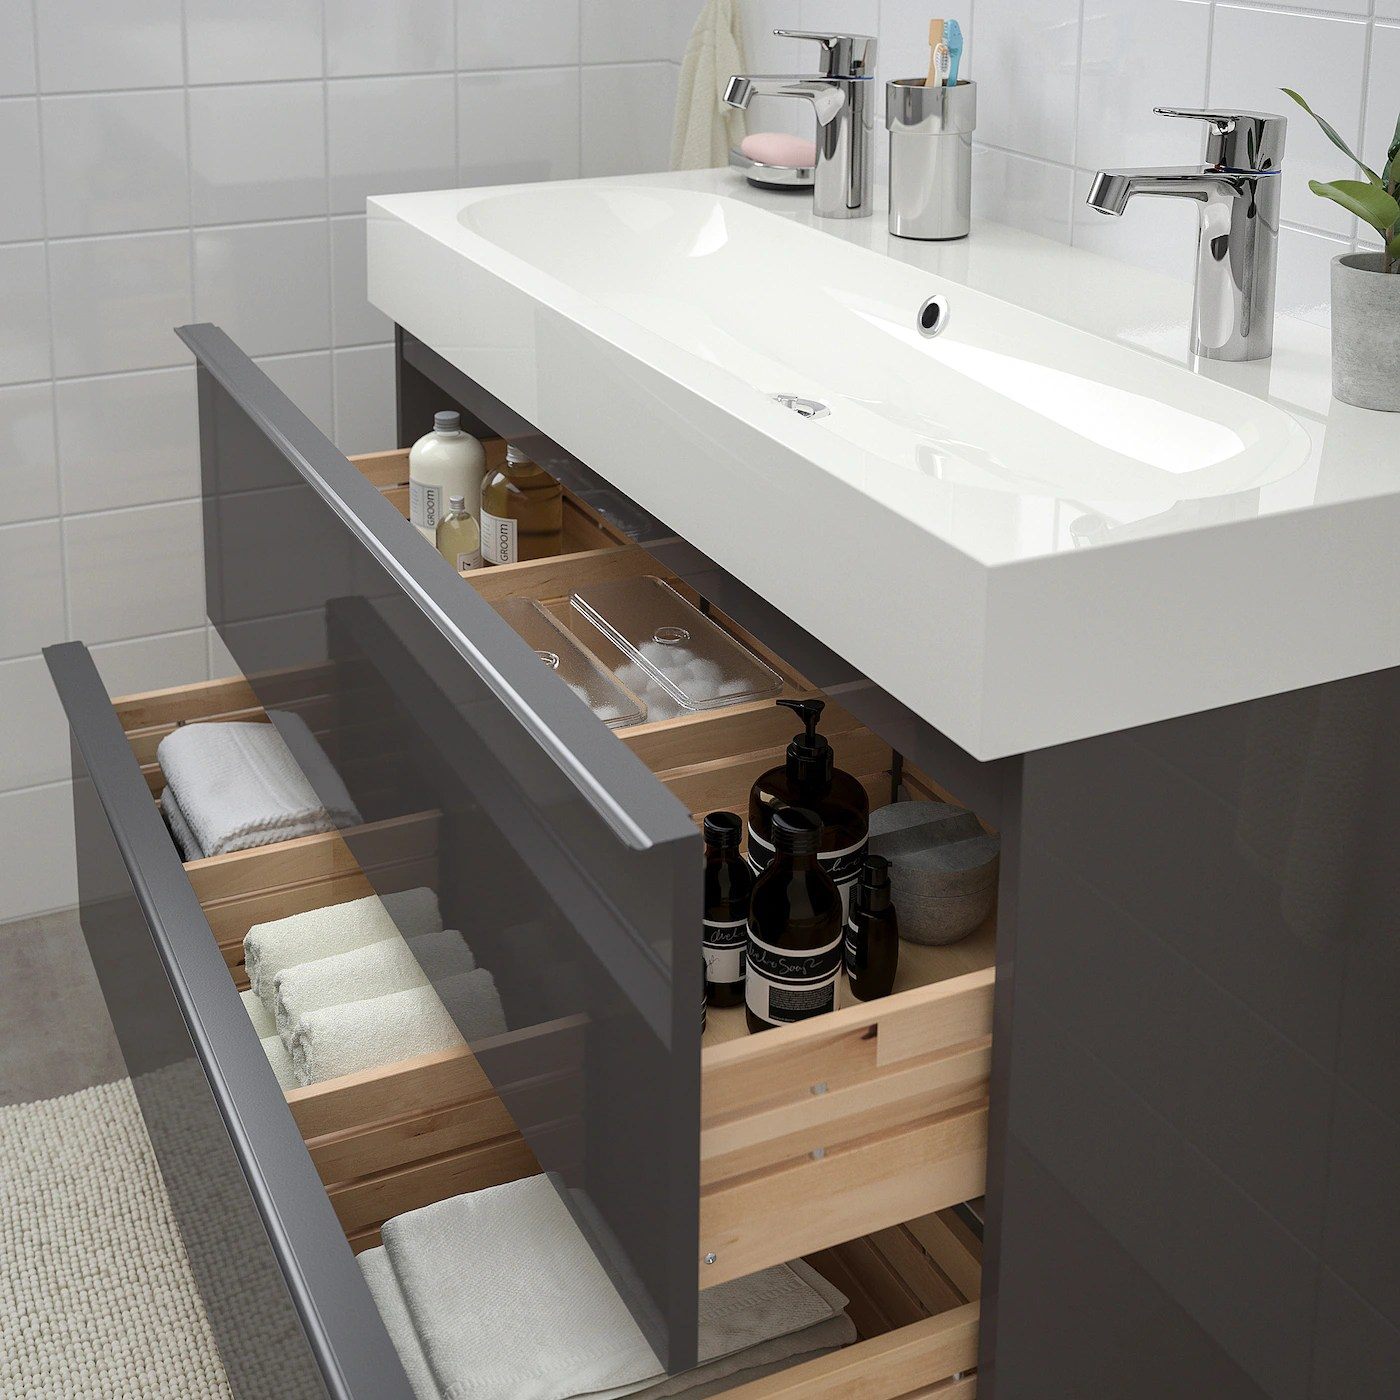 godmorgon braviken sink cabinet with 2 drawers high gloss gray brogrund faucet 39 3 8x18 7 8x26 3 4